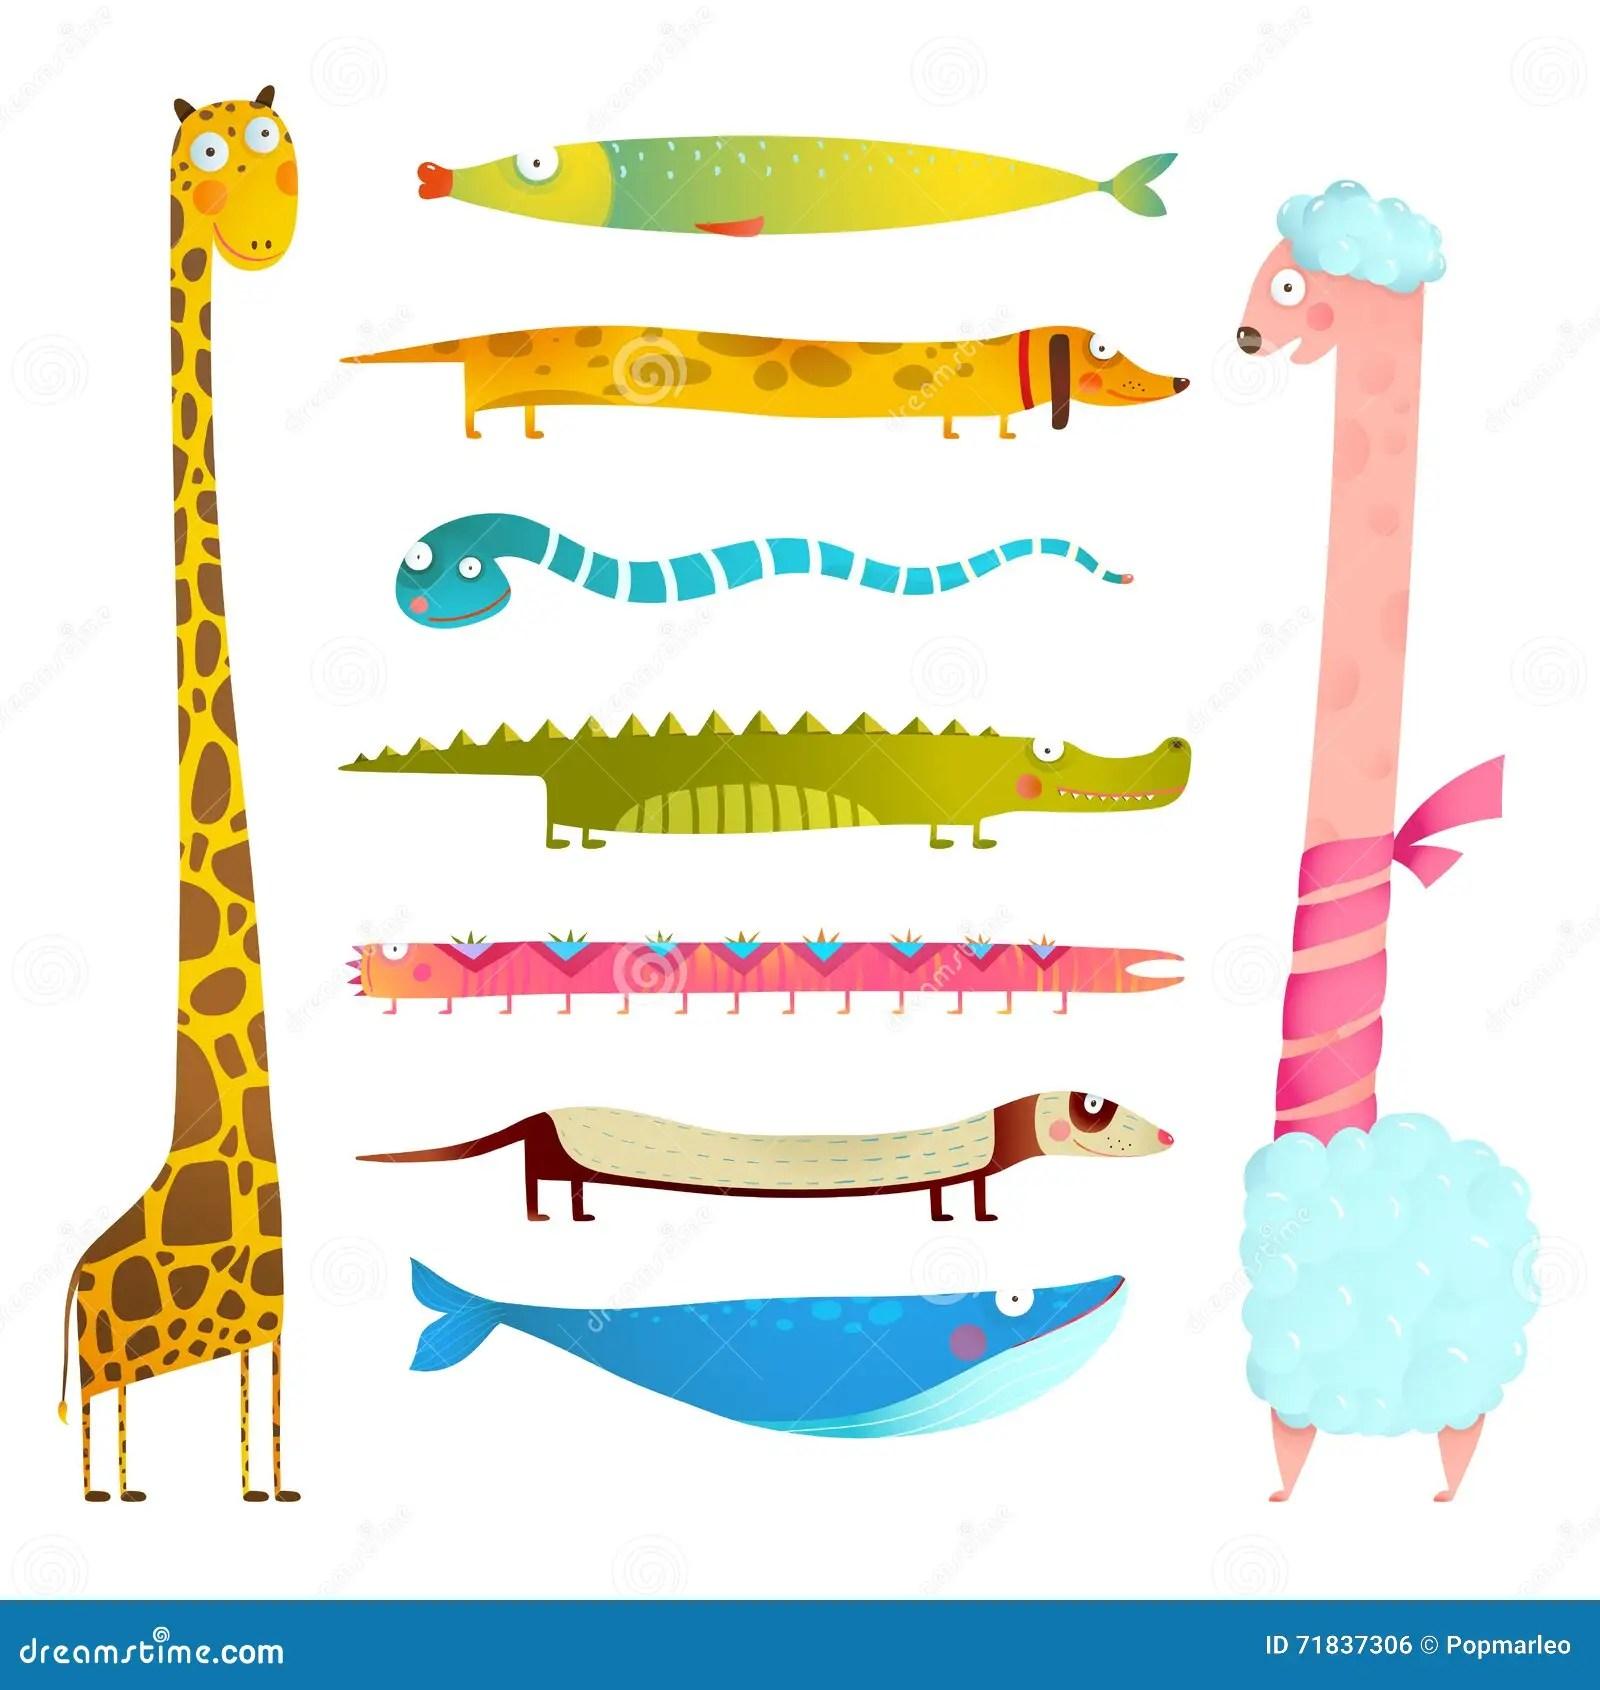 Fun Cartoon Long Animals Illustration Collection For Kids